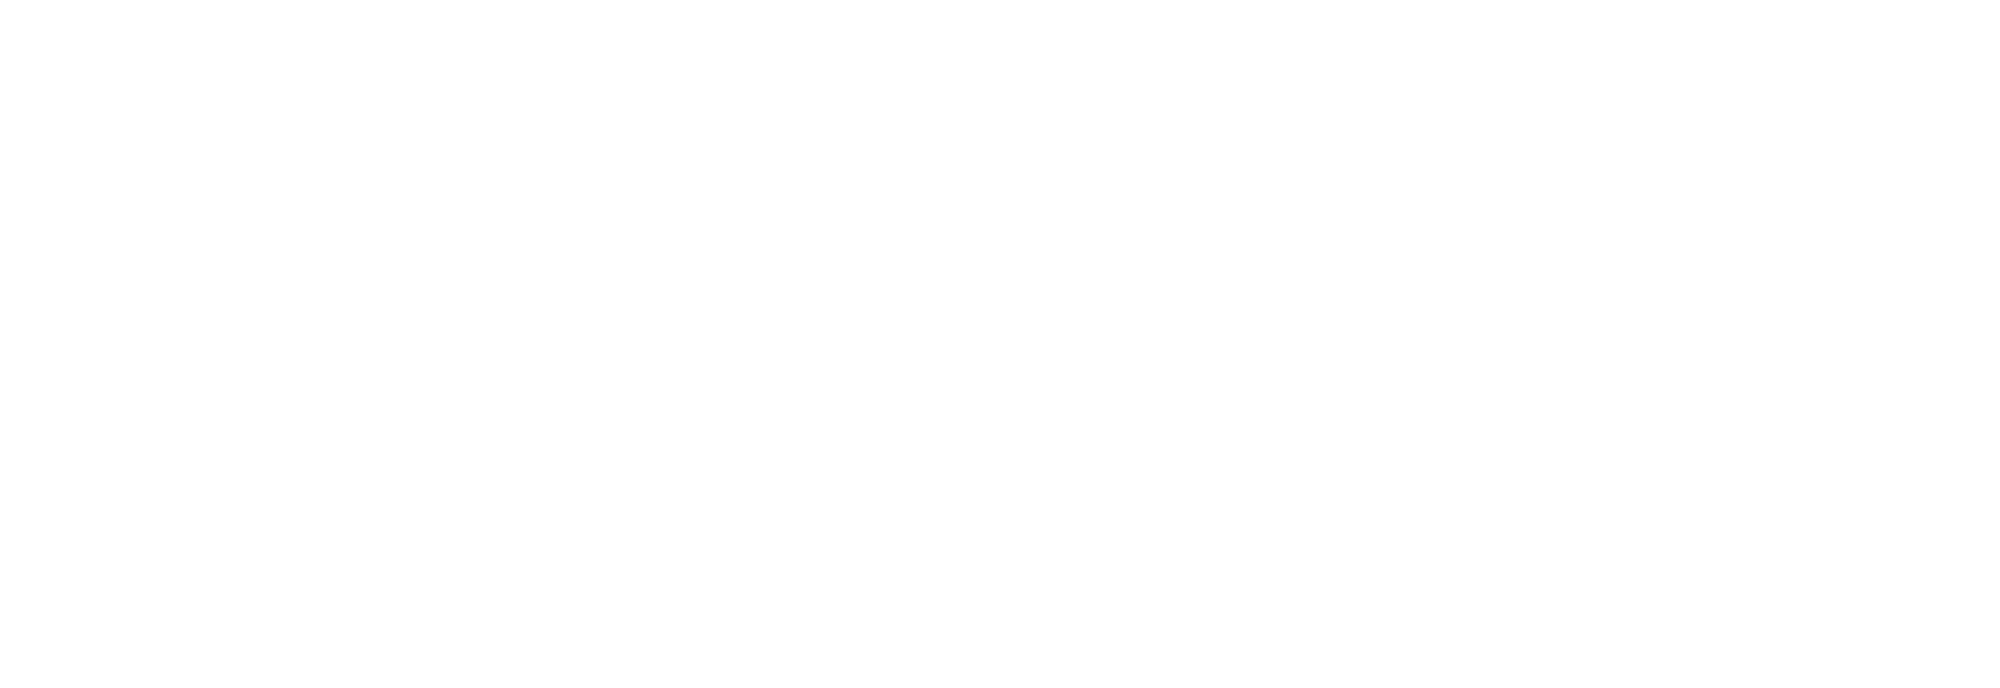 2018 web banner datoer.png